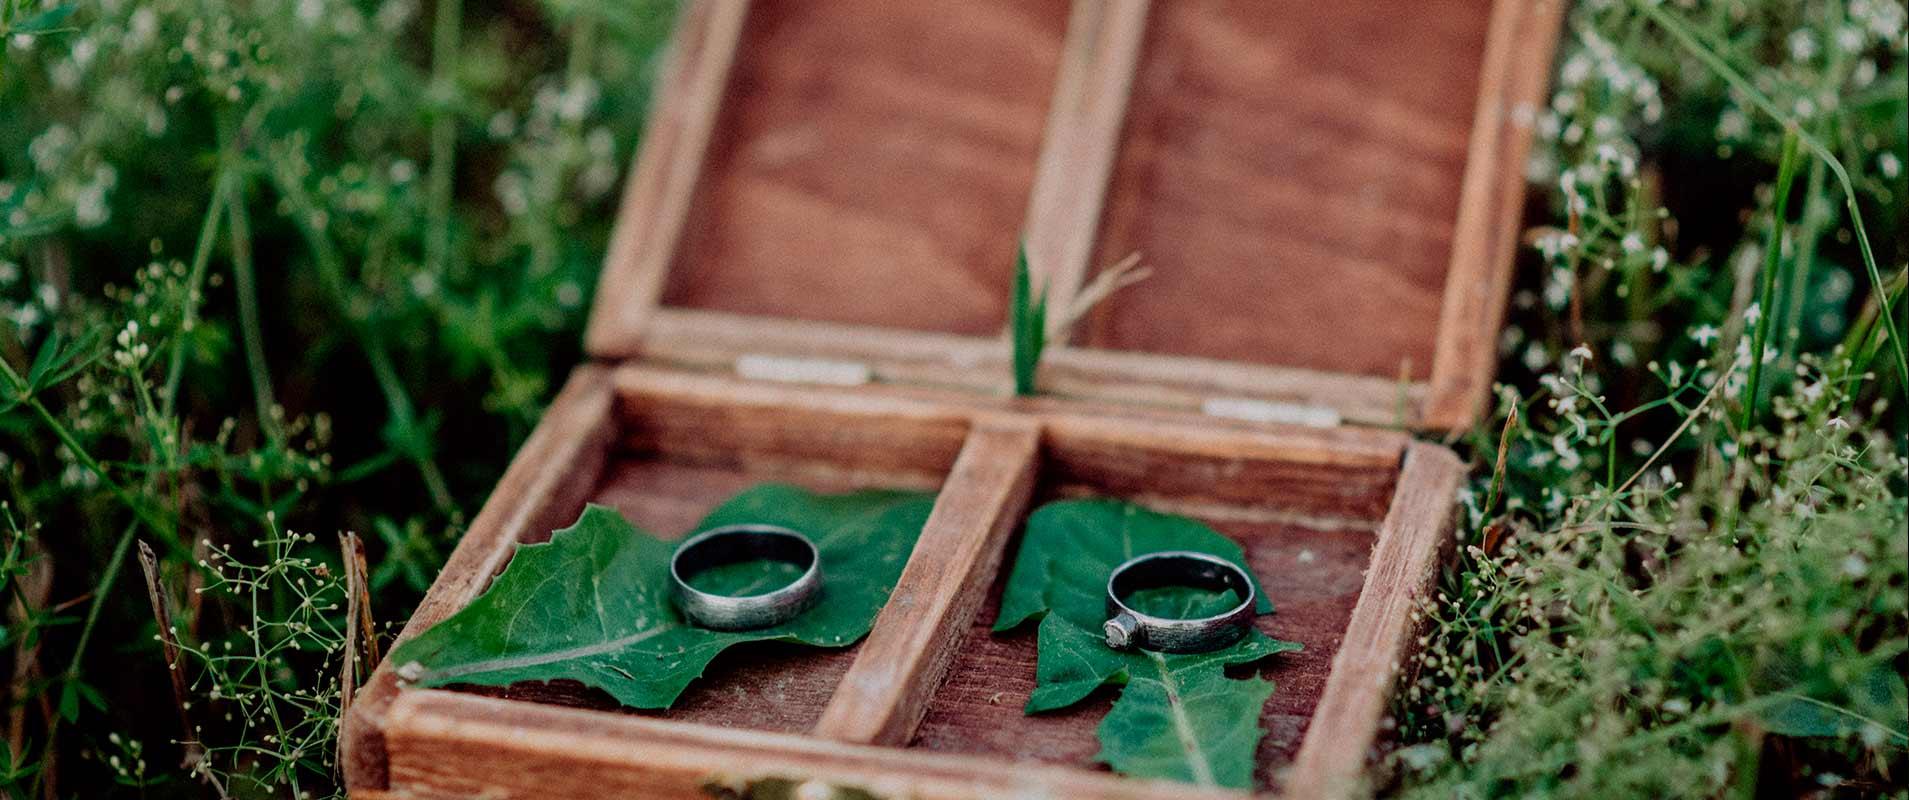 postafedi-accessori-per-matrimonio